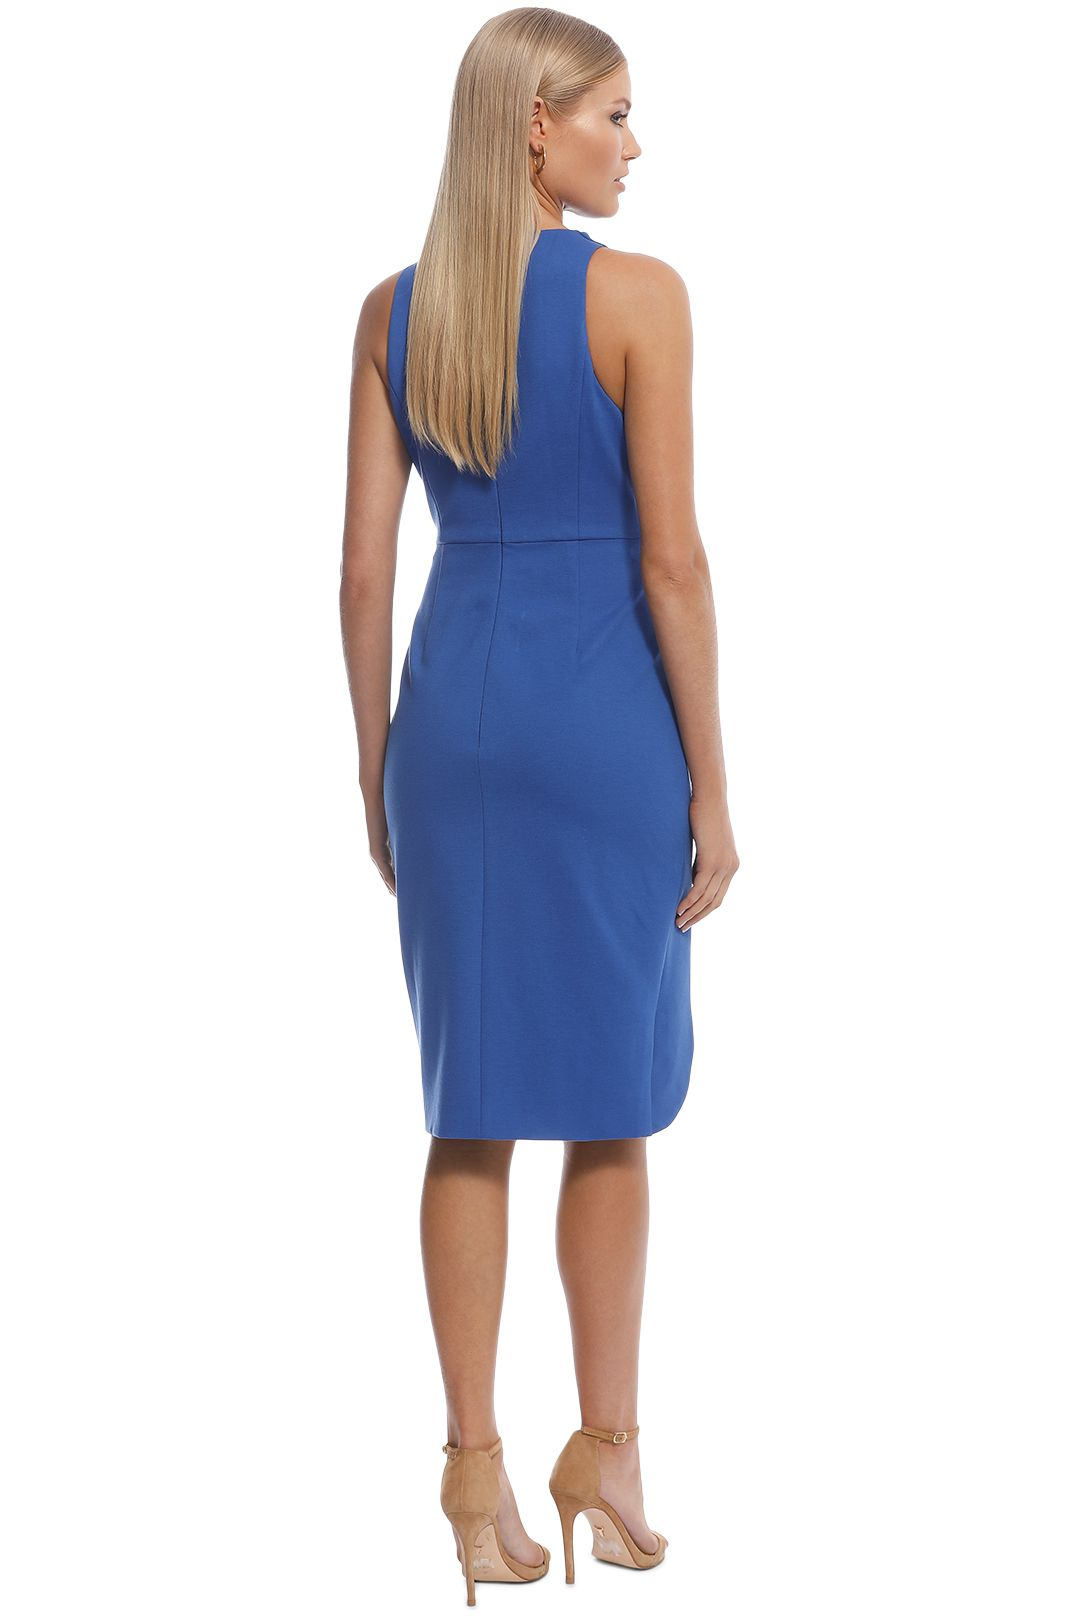 Elliatt - Carmen Dress - Cobalt - Back